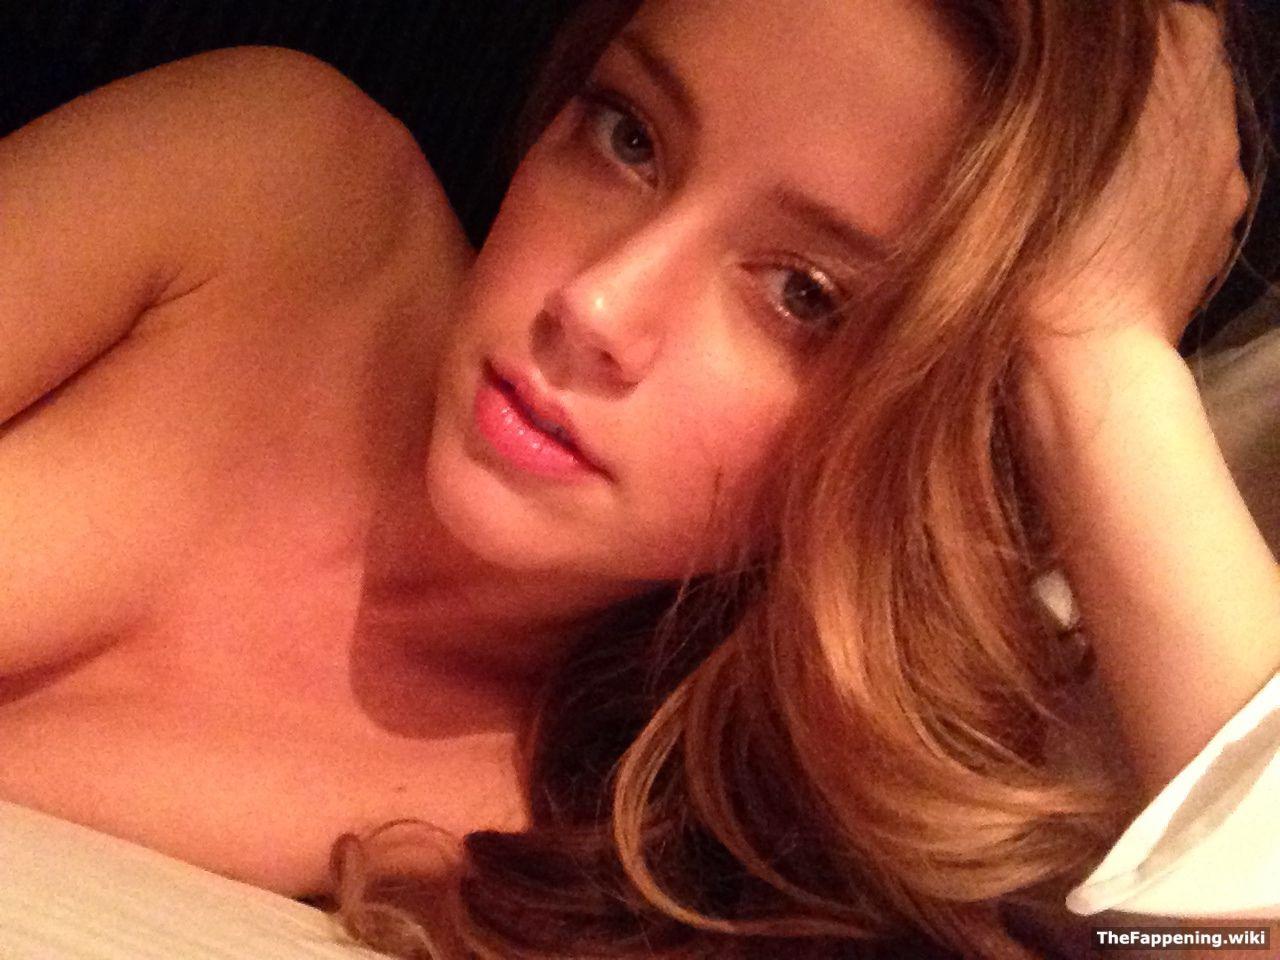 Leaked Fappening Amber Heard naked photo 2017